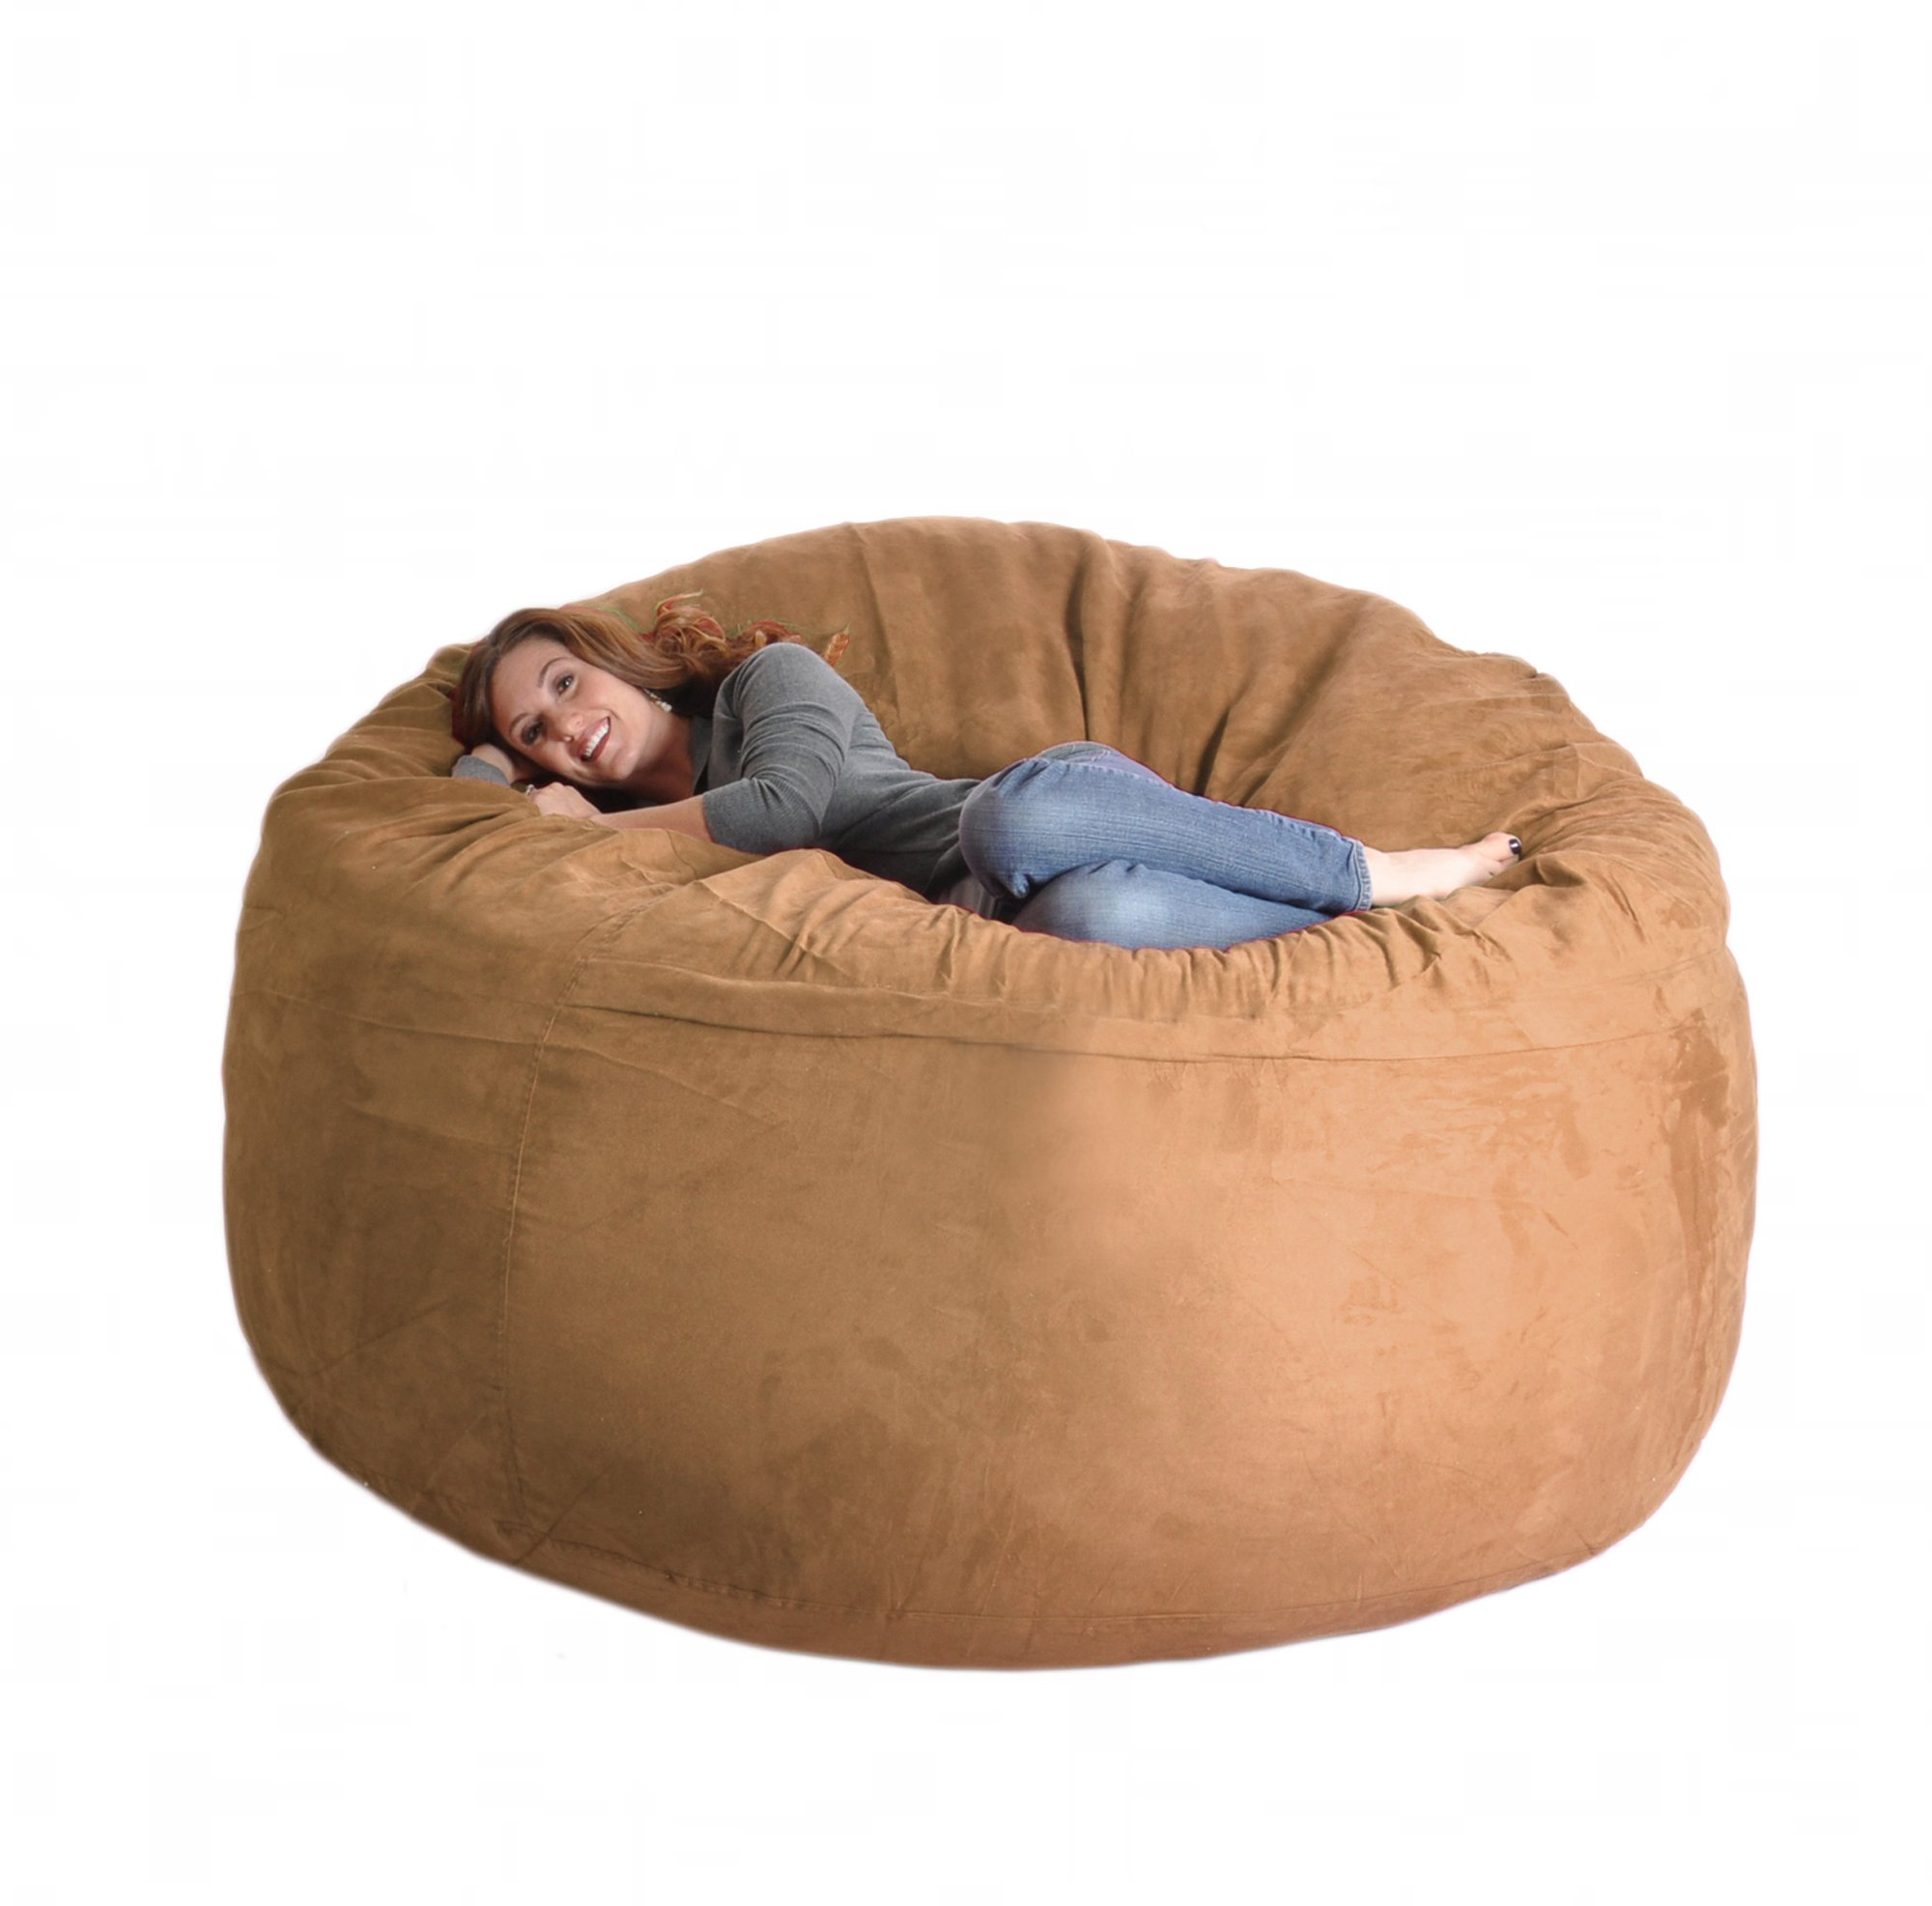 SLACKER sack Microfiber Foam Microsuede Beanbag Chair, 6-Feet, Earth Brown